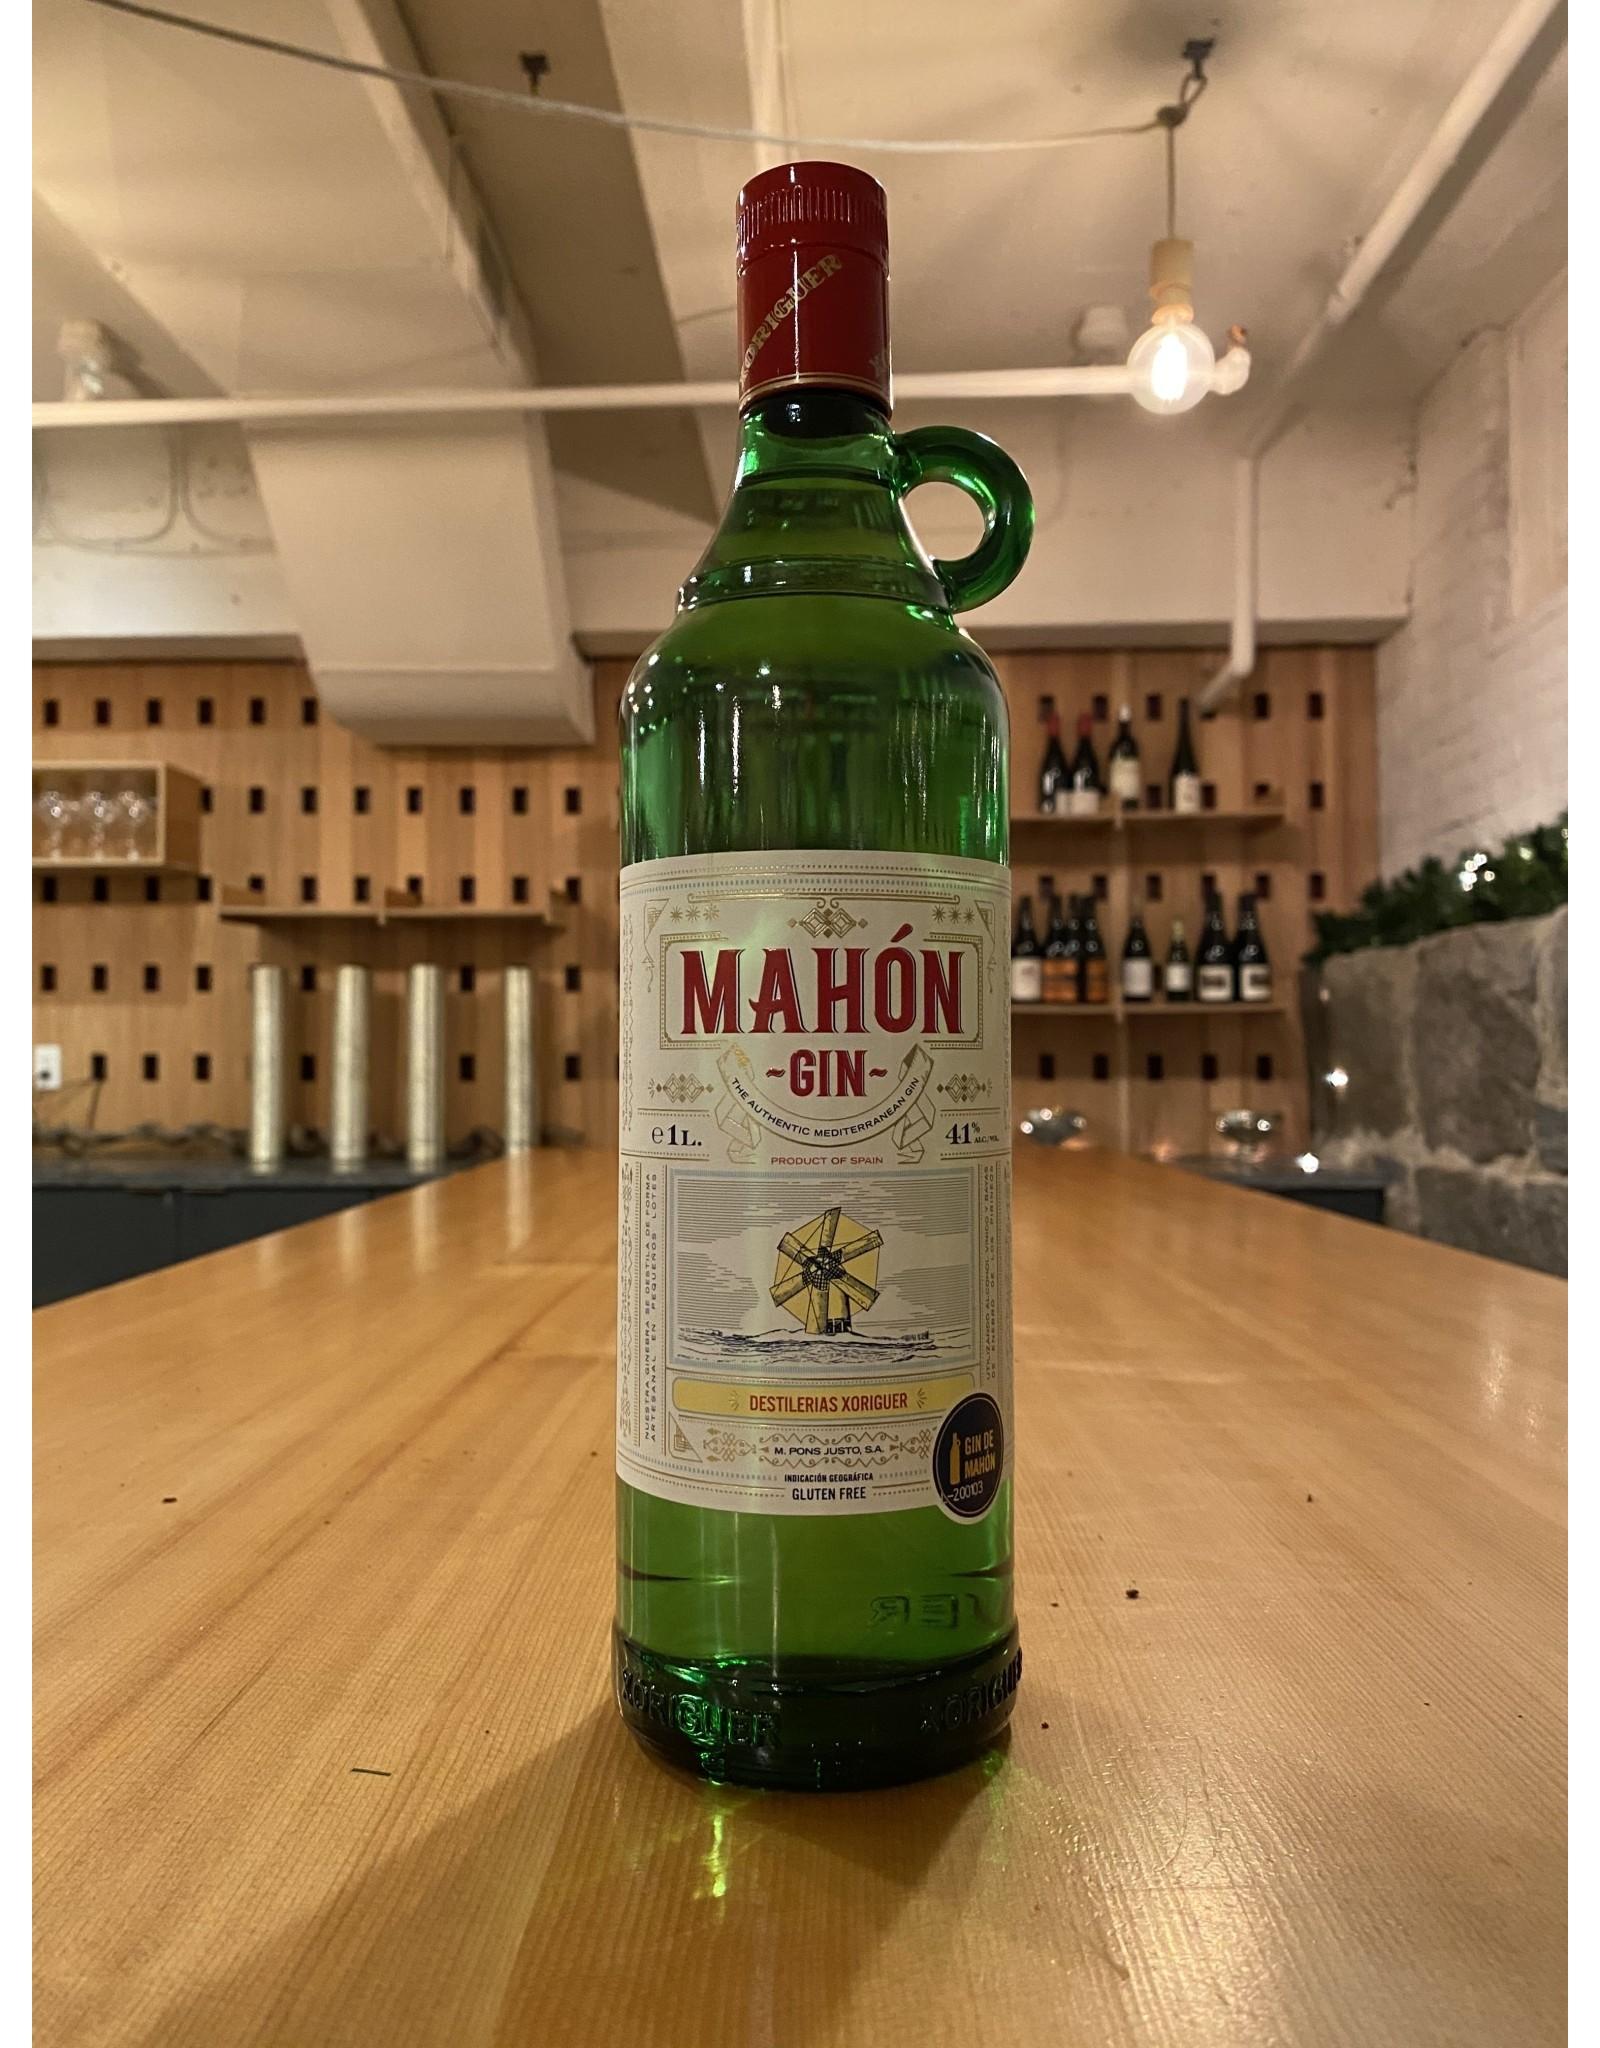 Gin Destilerias Xoriguer ''Gin de Mahon'' Gluten Free Gin 1 Liter - Menorca, Spain